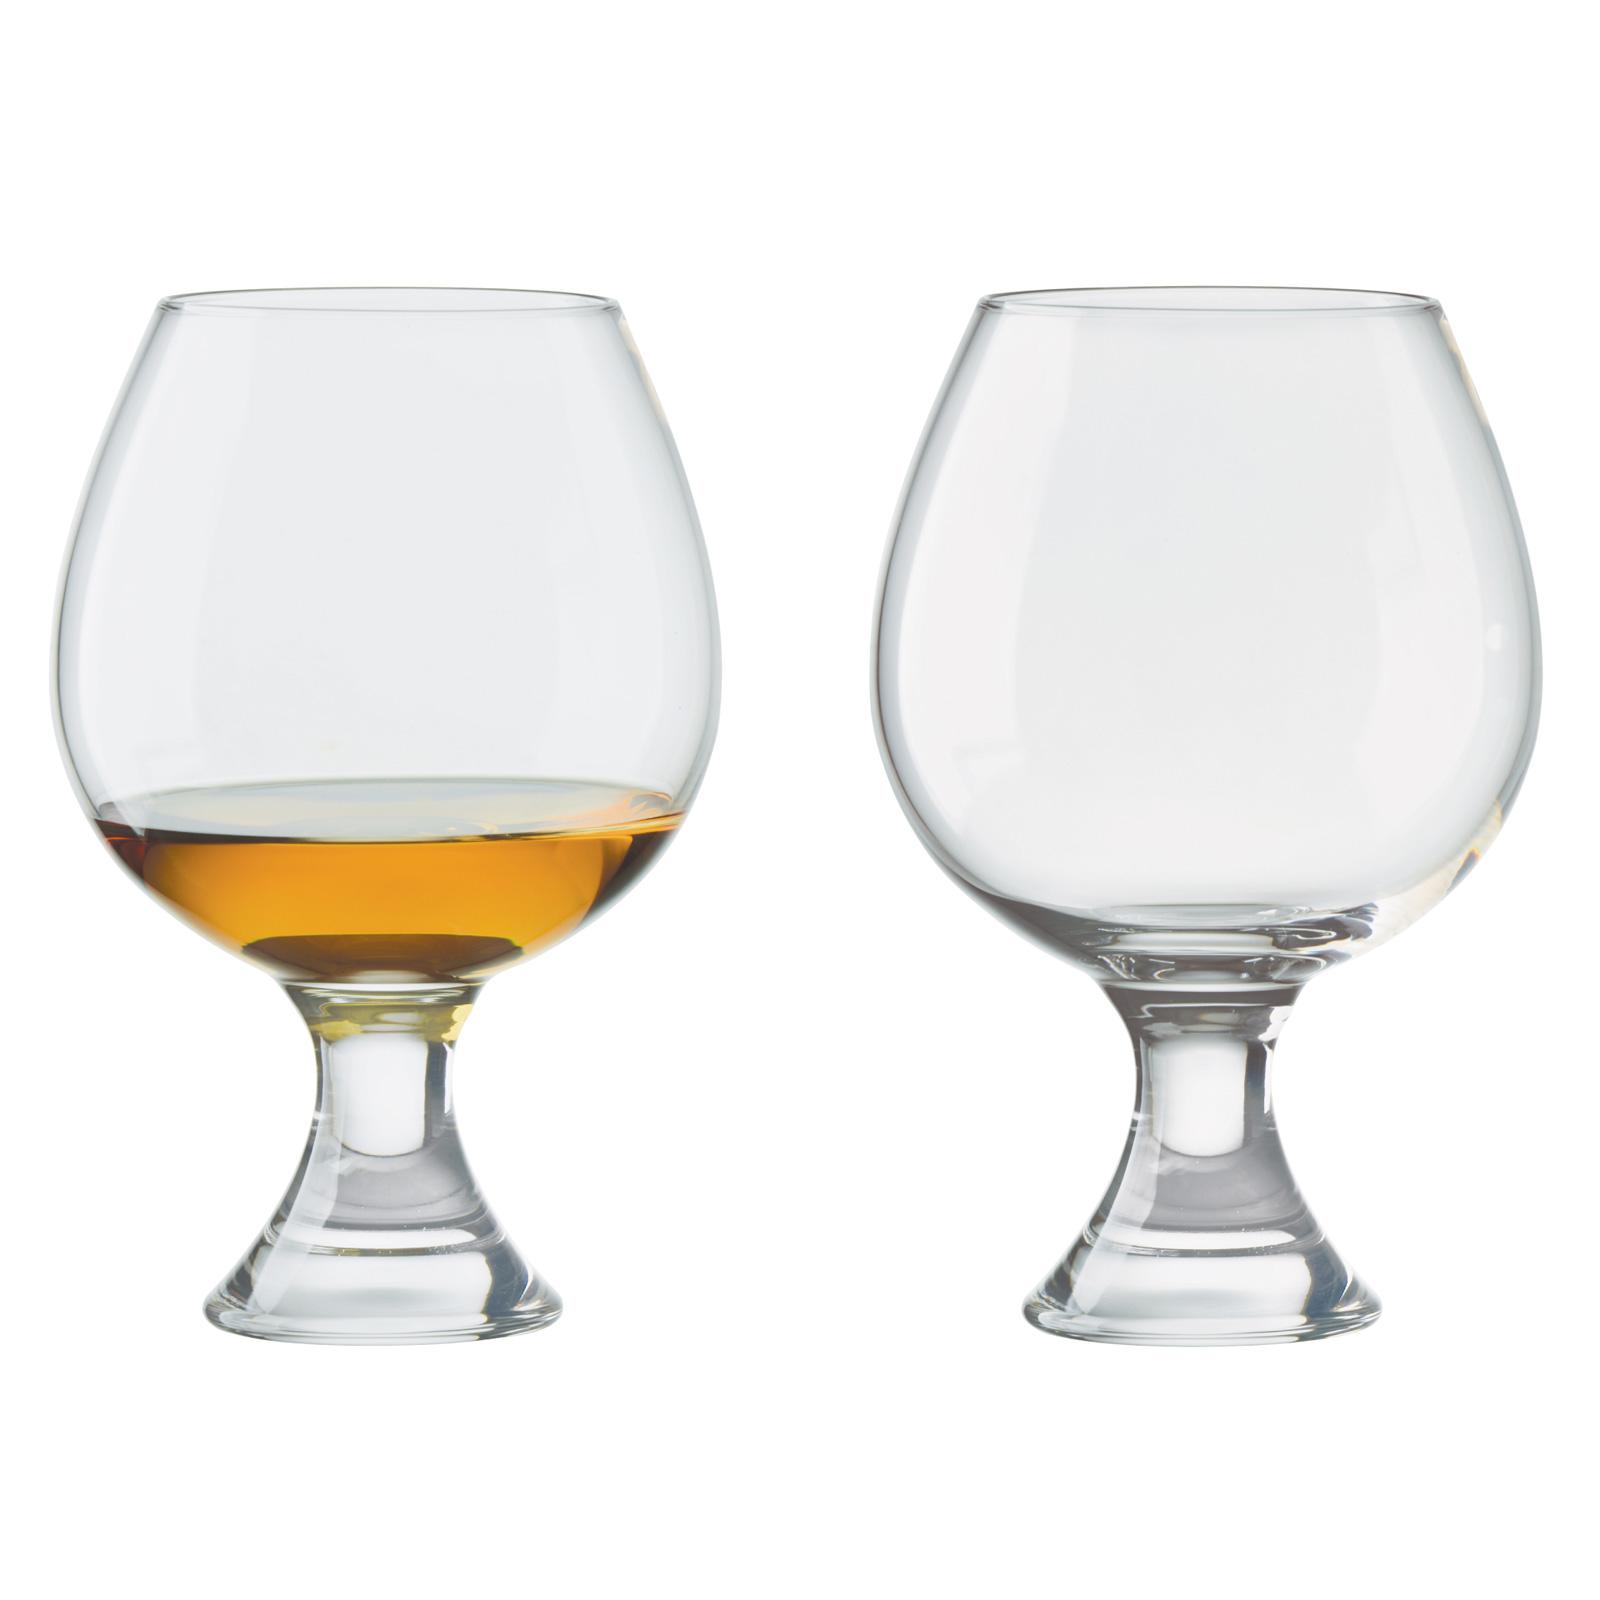 Set of 2 Manhattan Brandy Glasses by Anton Studio Designs